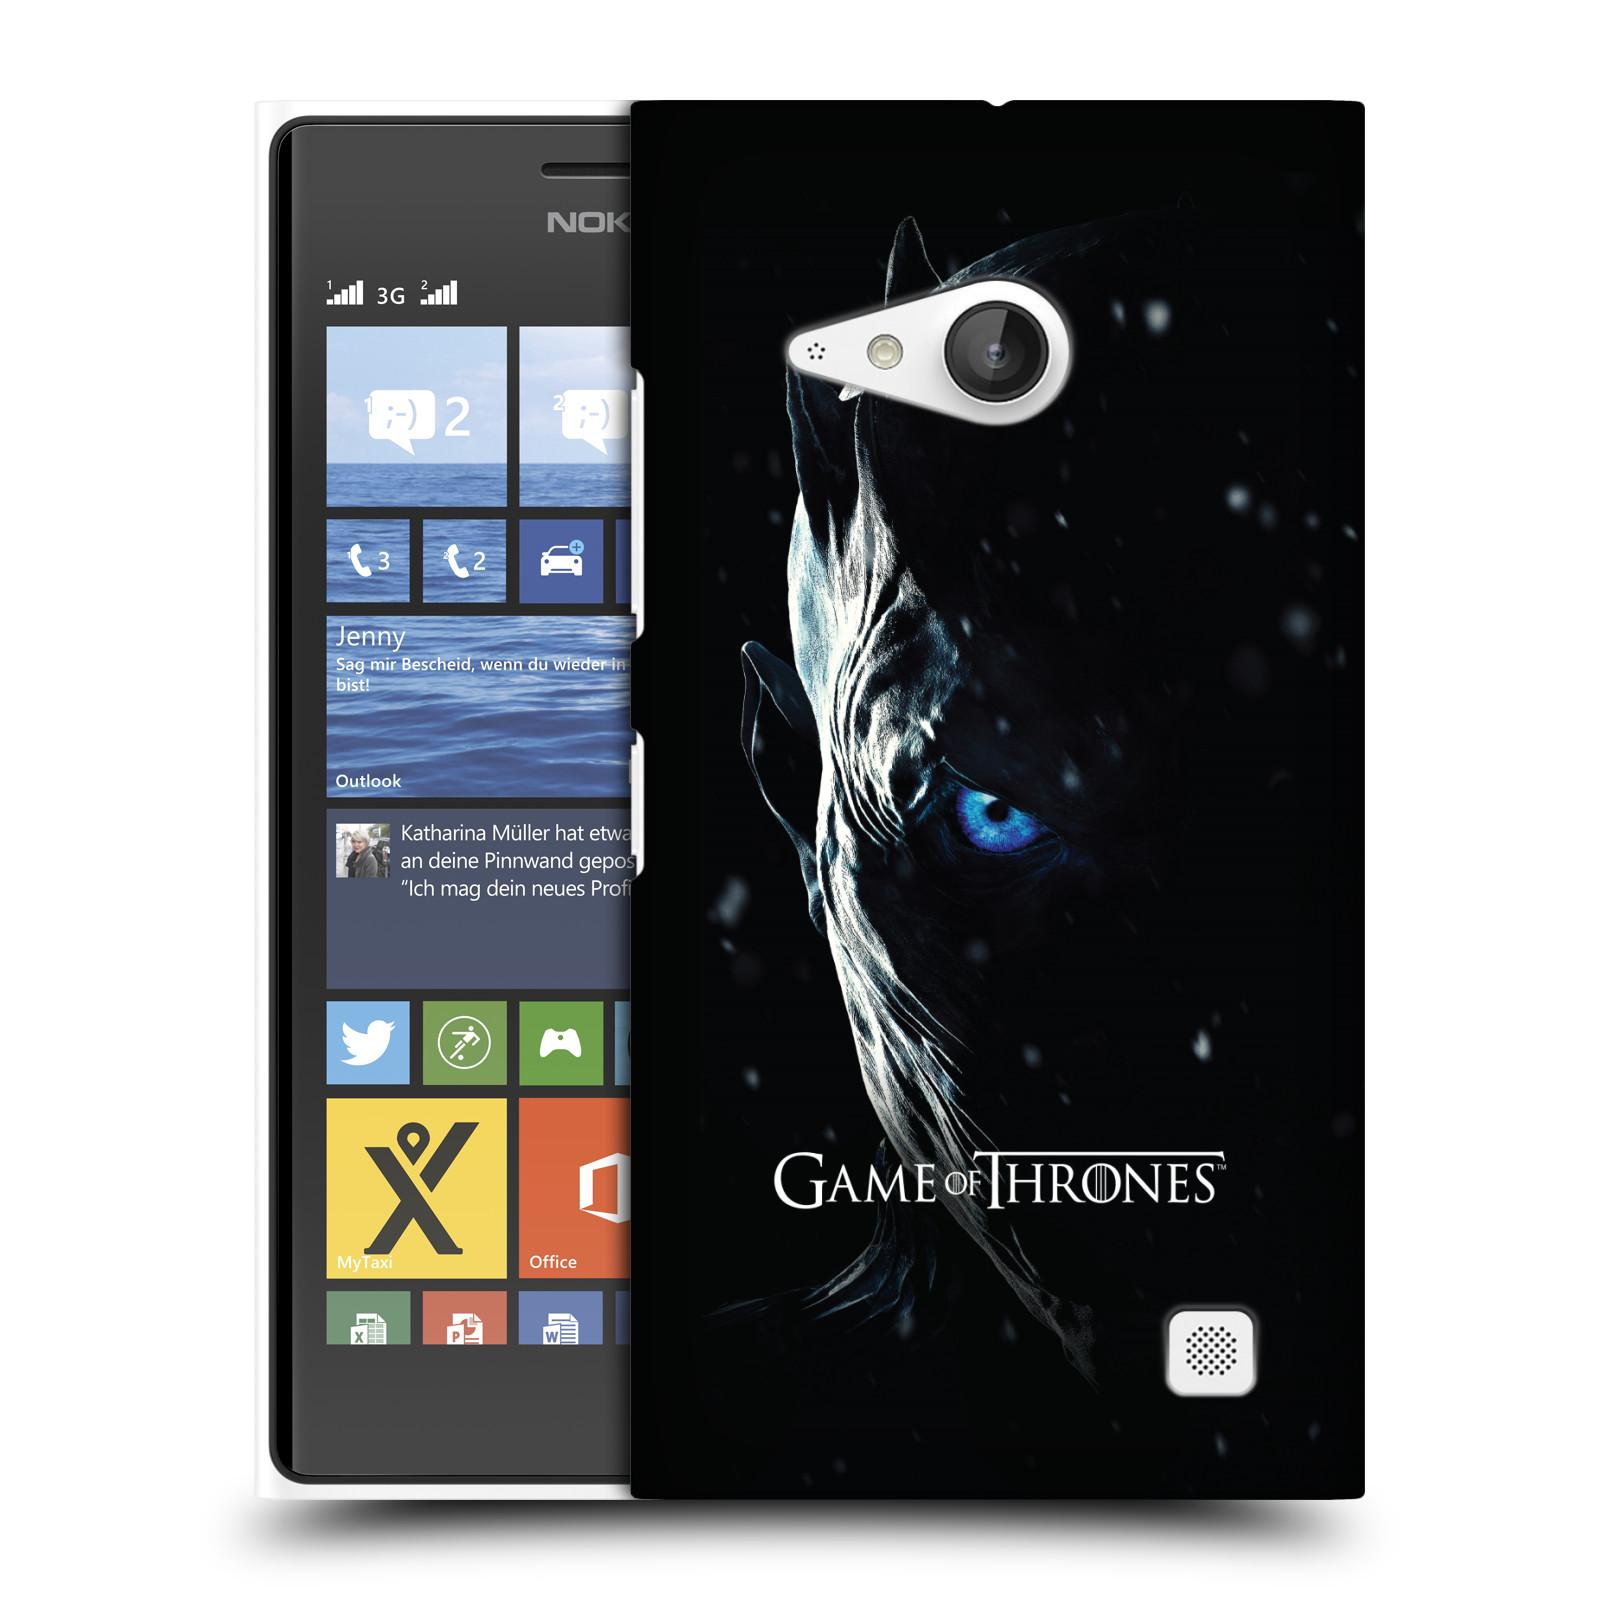 Plastové pouzdro na mobil Nokia Lumia 730 Dual SIM - Head Case - Hra o trůny - Night King (Plastový kryt či obal na mobilní telefon s motivem Game of Thrones - Night King - Season 7 pro Nokia Lumia 730 Dual SIM)